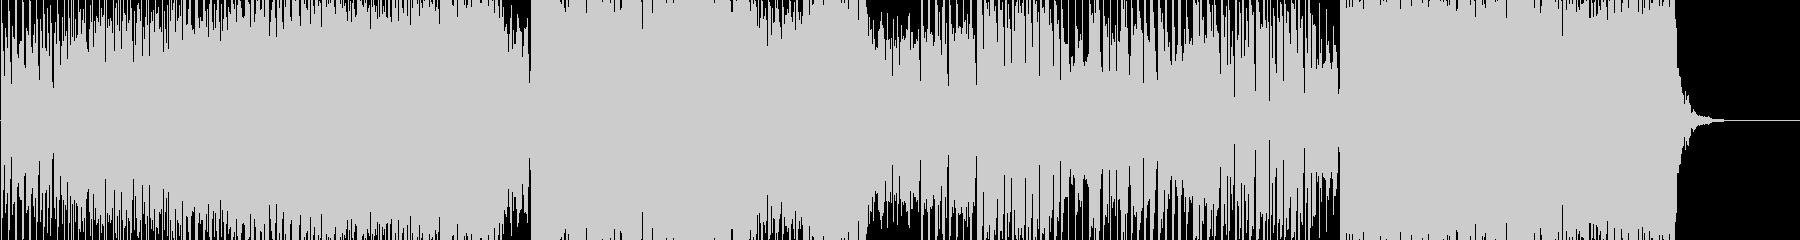 EDM風のシンセロック&ジャズピアノの未再生の波形